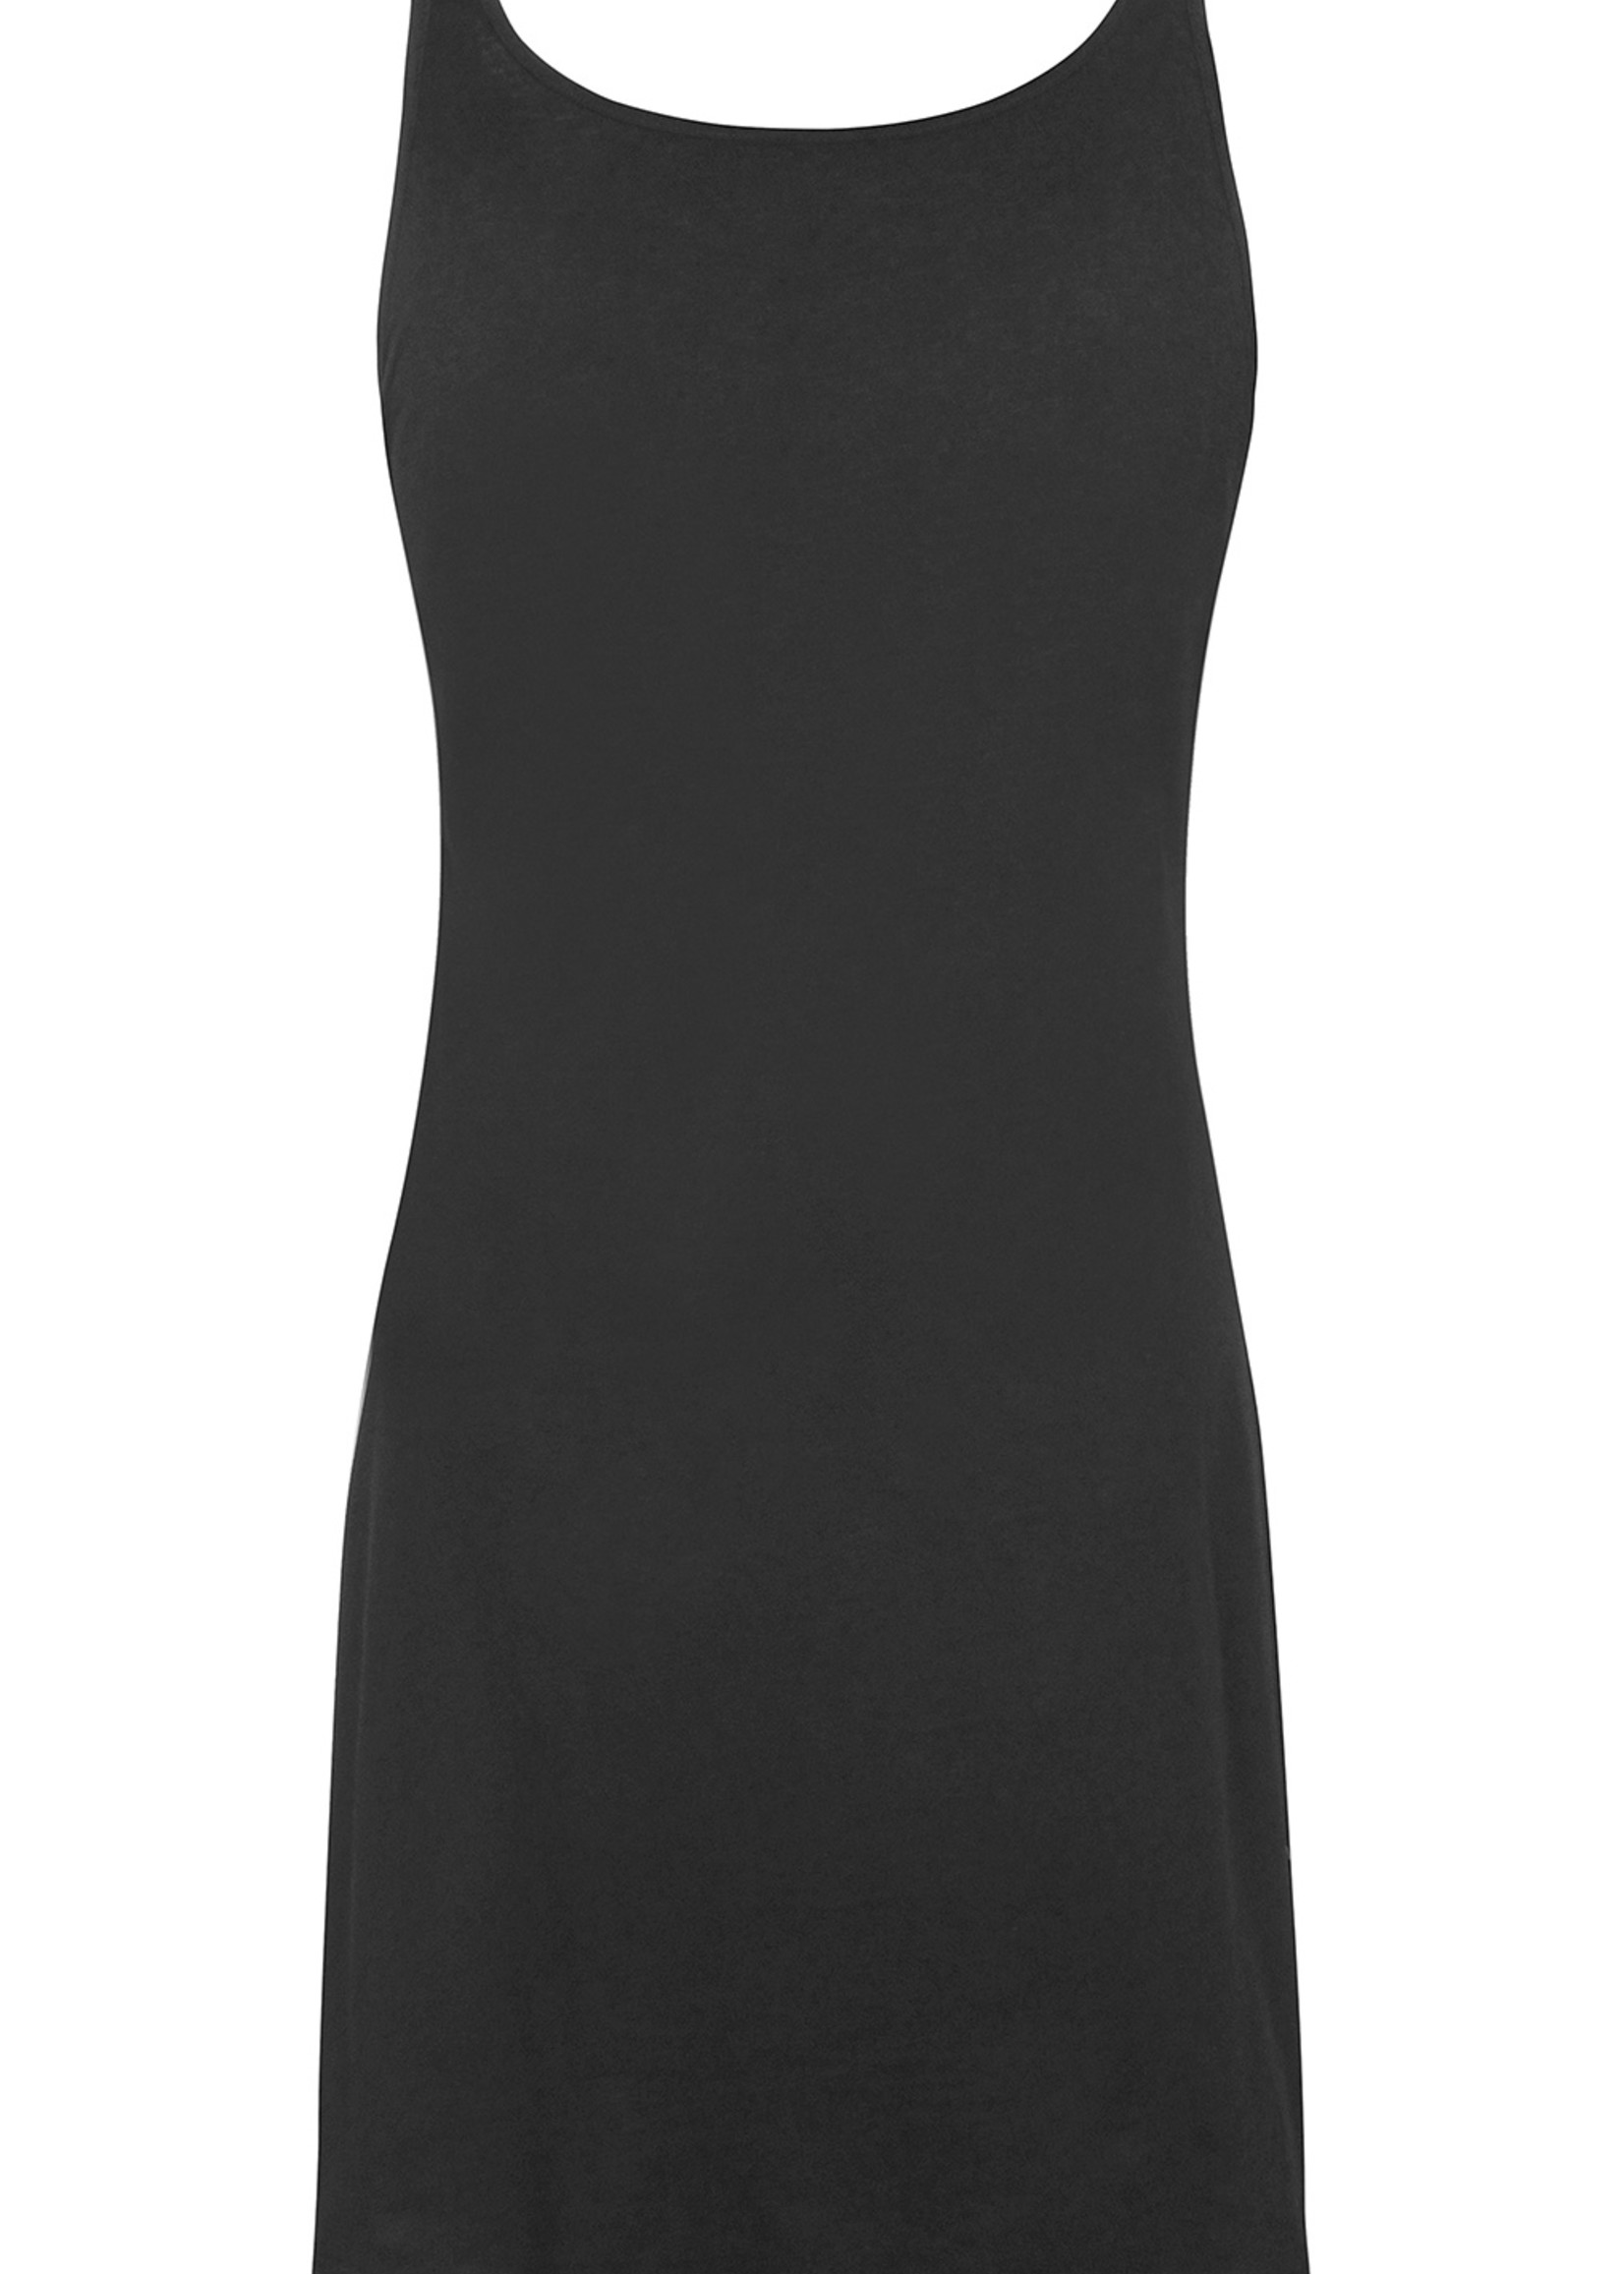 Zhenzi Zhenzi Stef Basic Dress